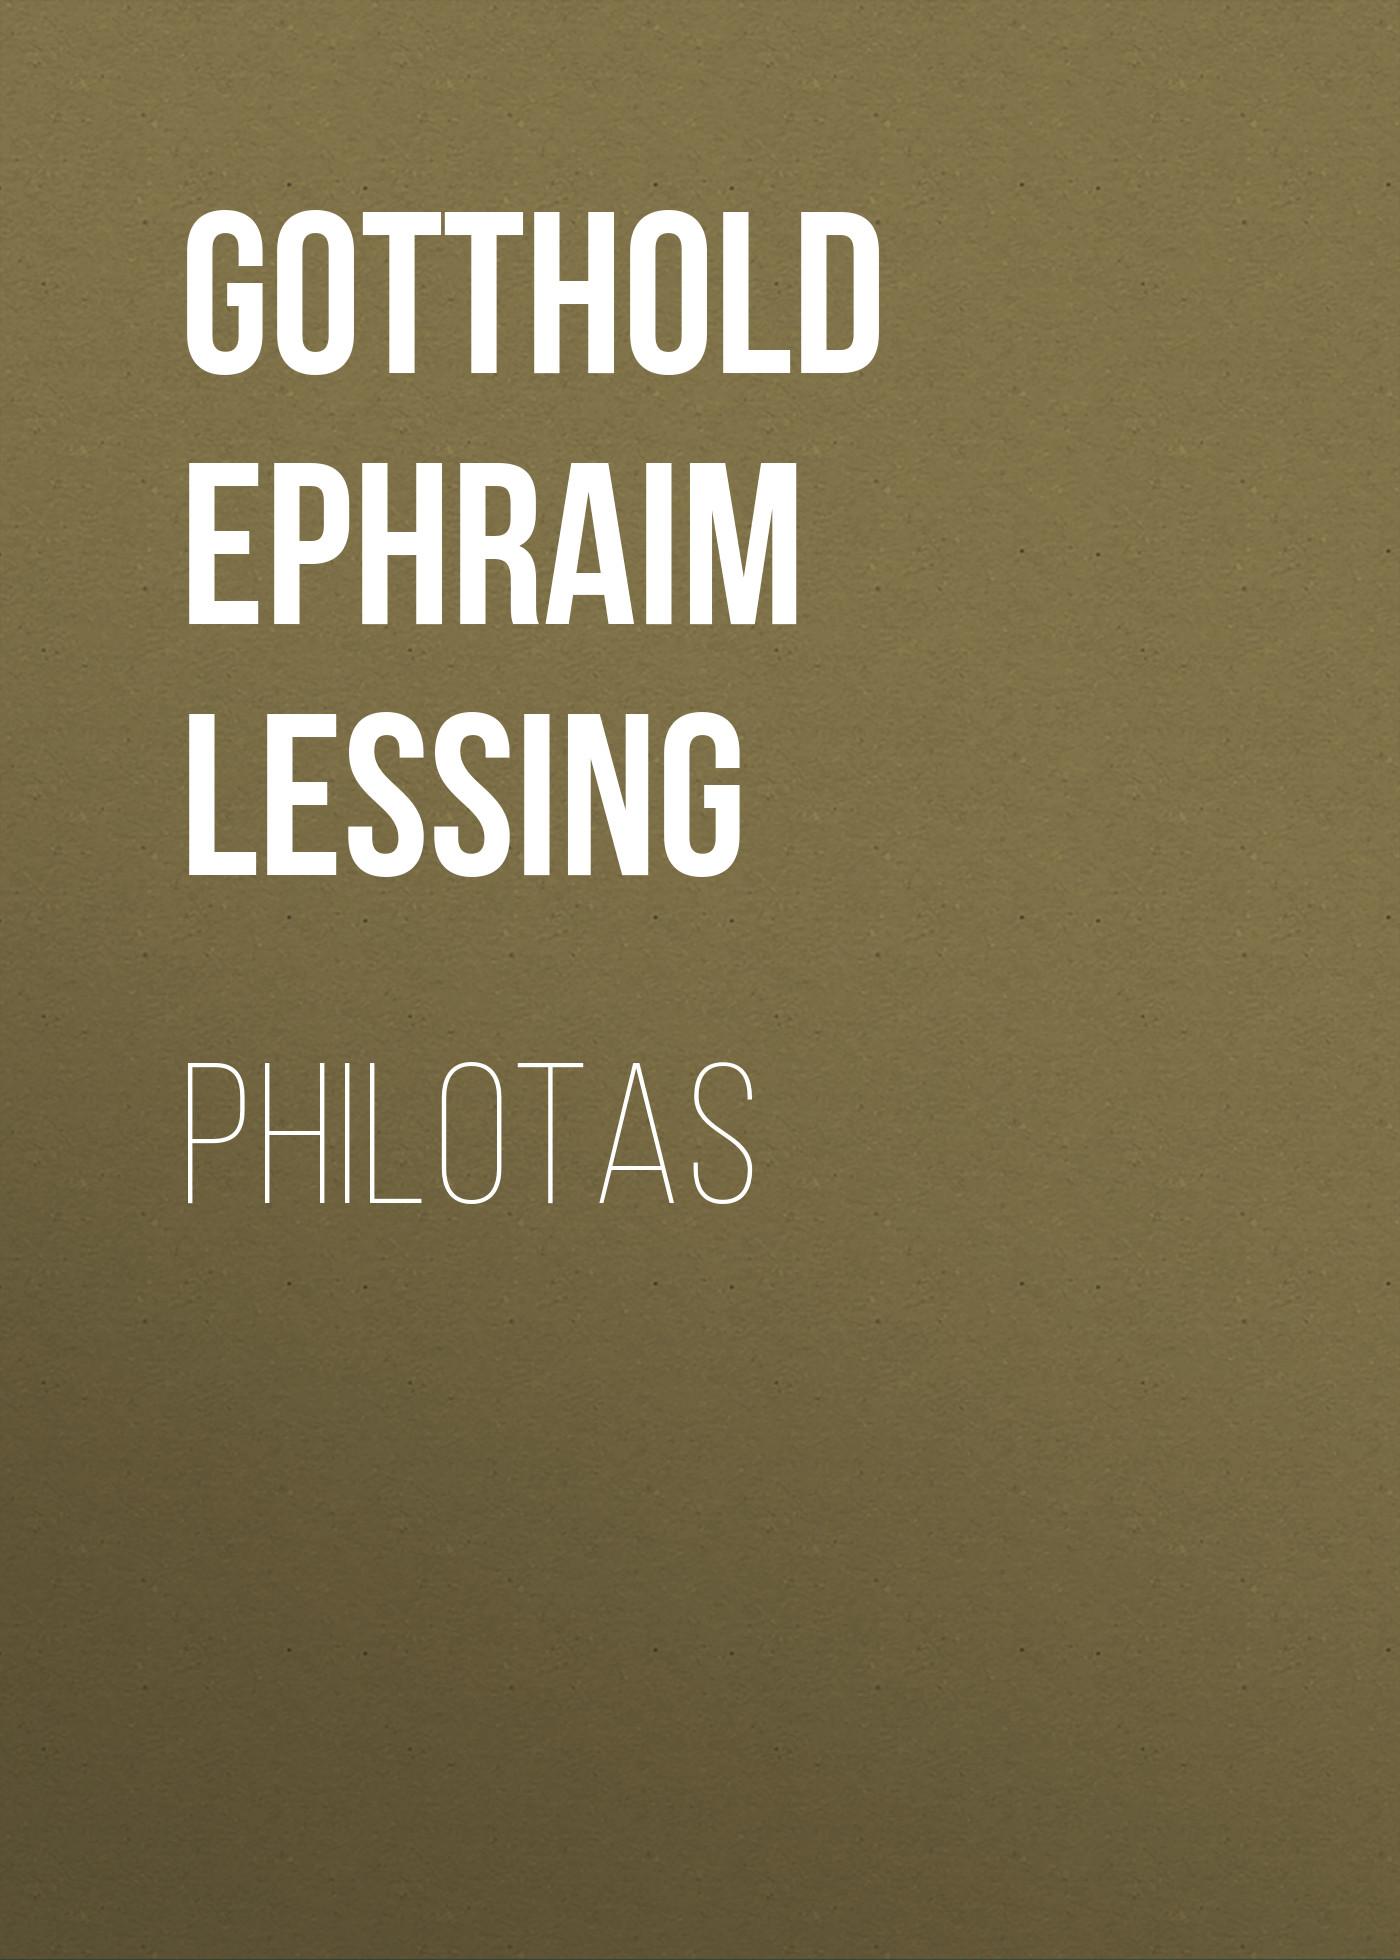 Gotthold Ephraim Lessing Philotas недорого